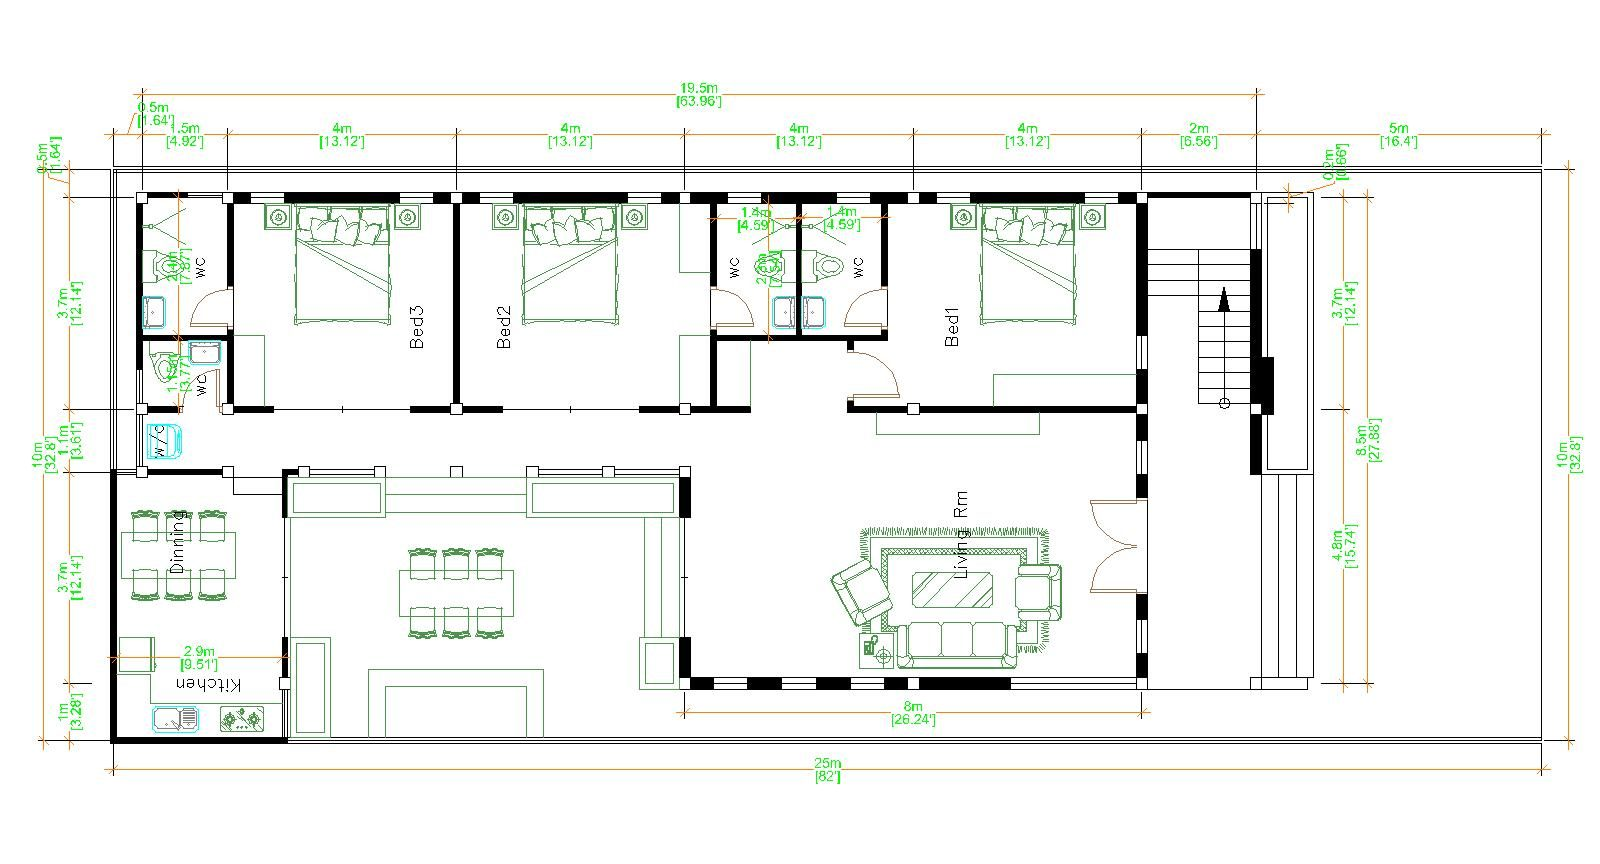 Modern Home Plans 10x25 with 33x82 Feet 3 Beds floor plan